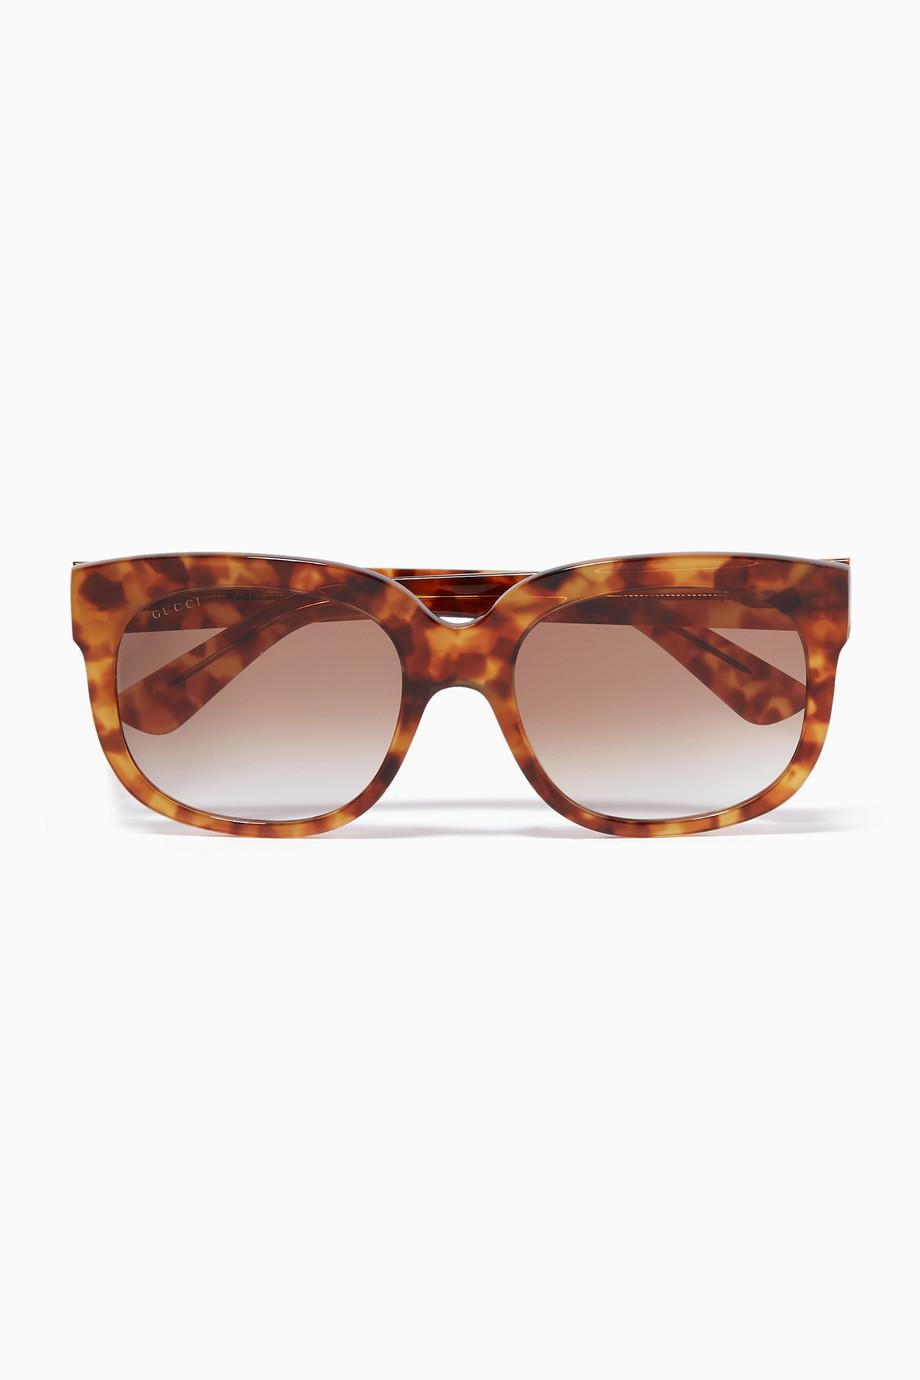 60148a47d6f5c تسوق نظارة شمسية بإطار مربع بني Gucci بنى للنساء